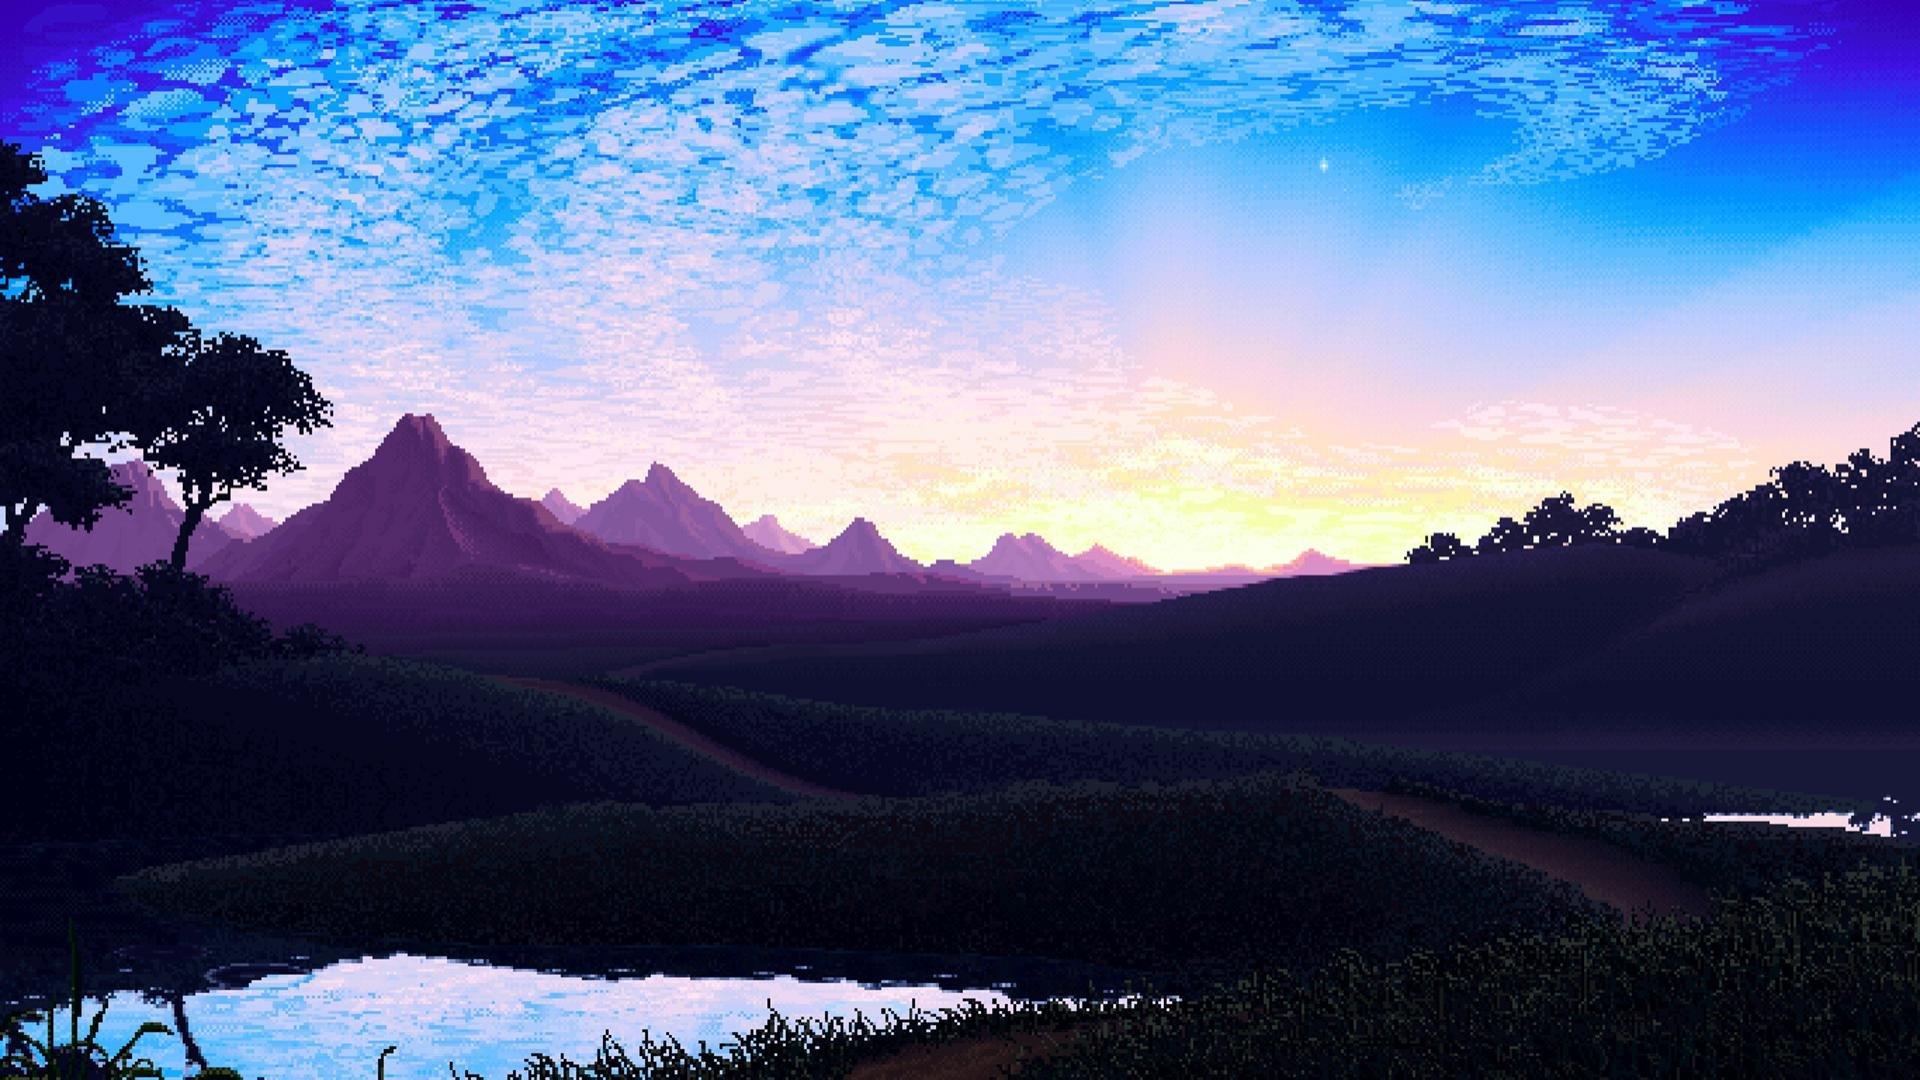 Pixel Art Wallpapers 1920x1080 Full HD (1080p) Desktop